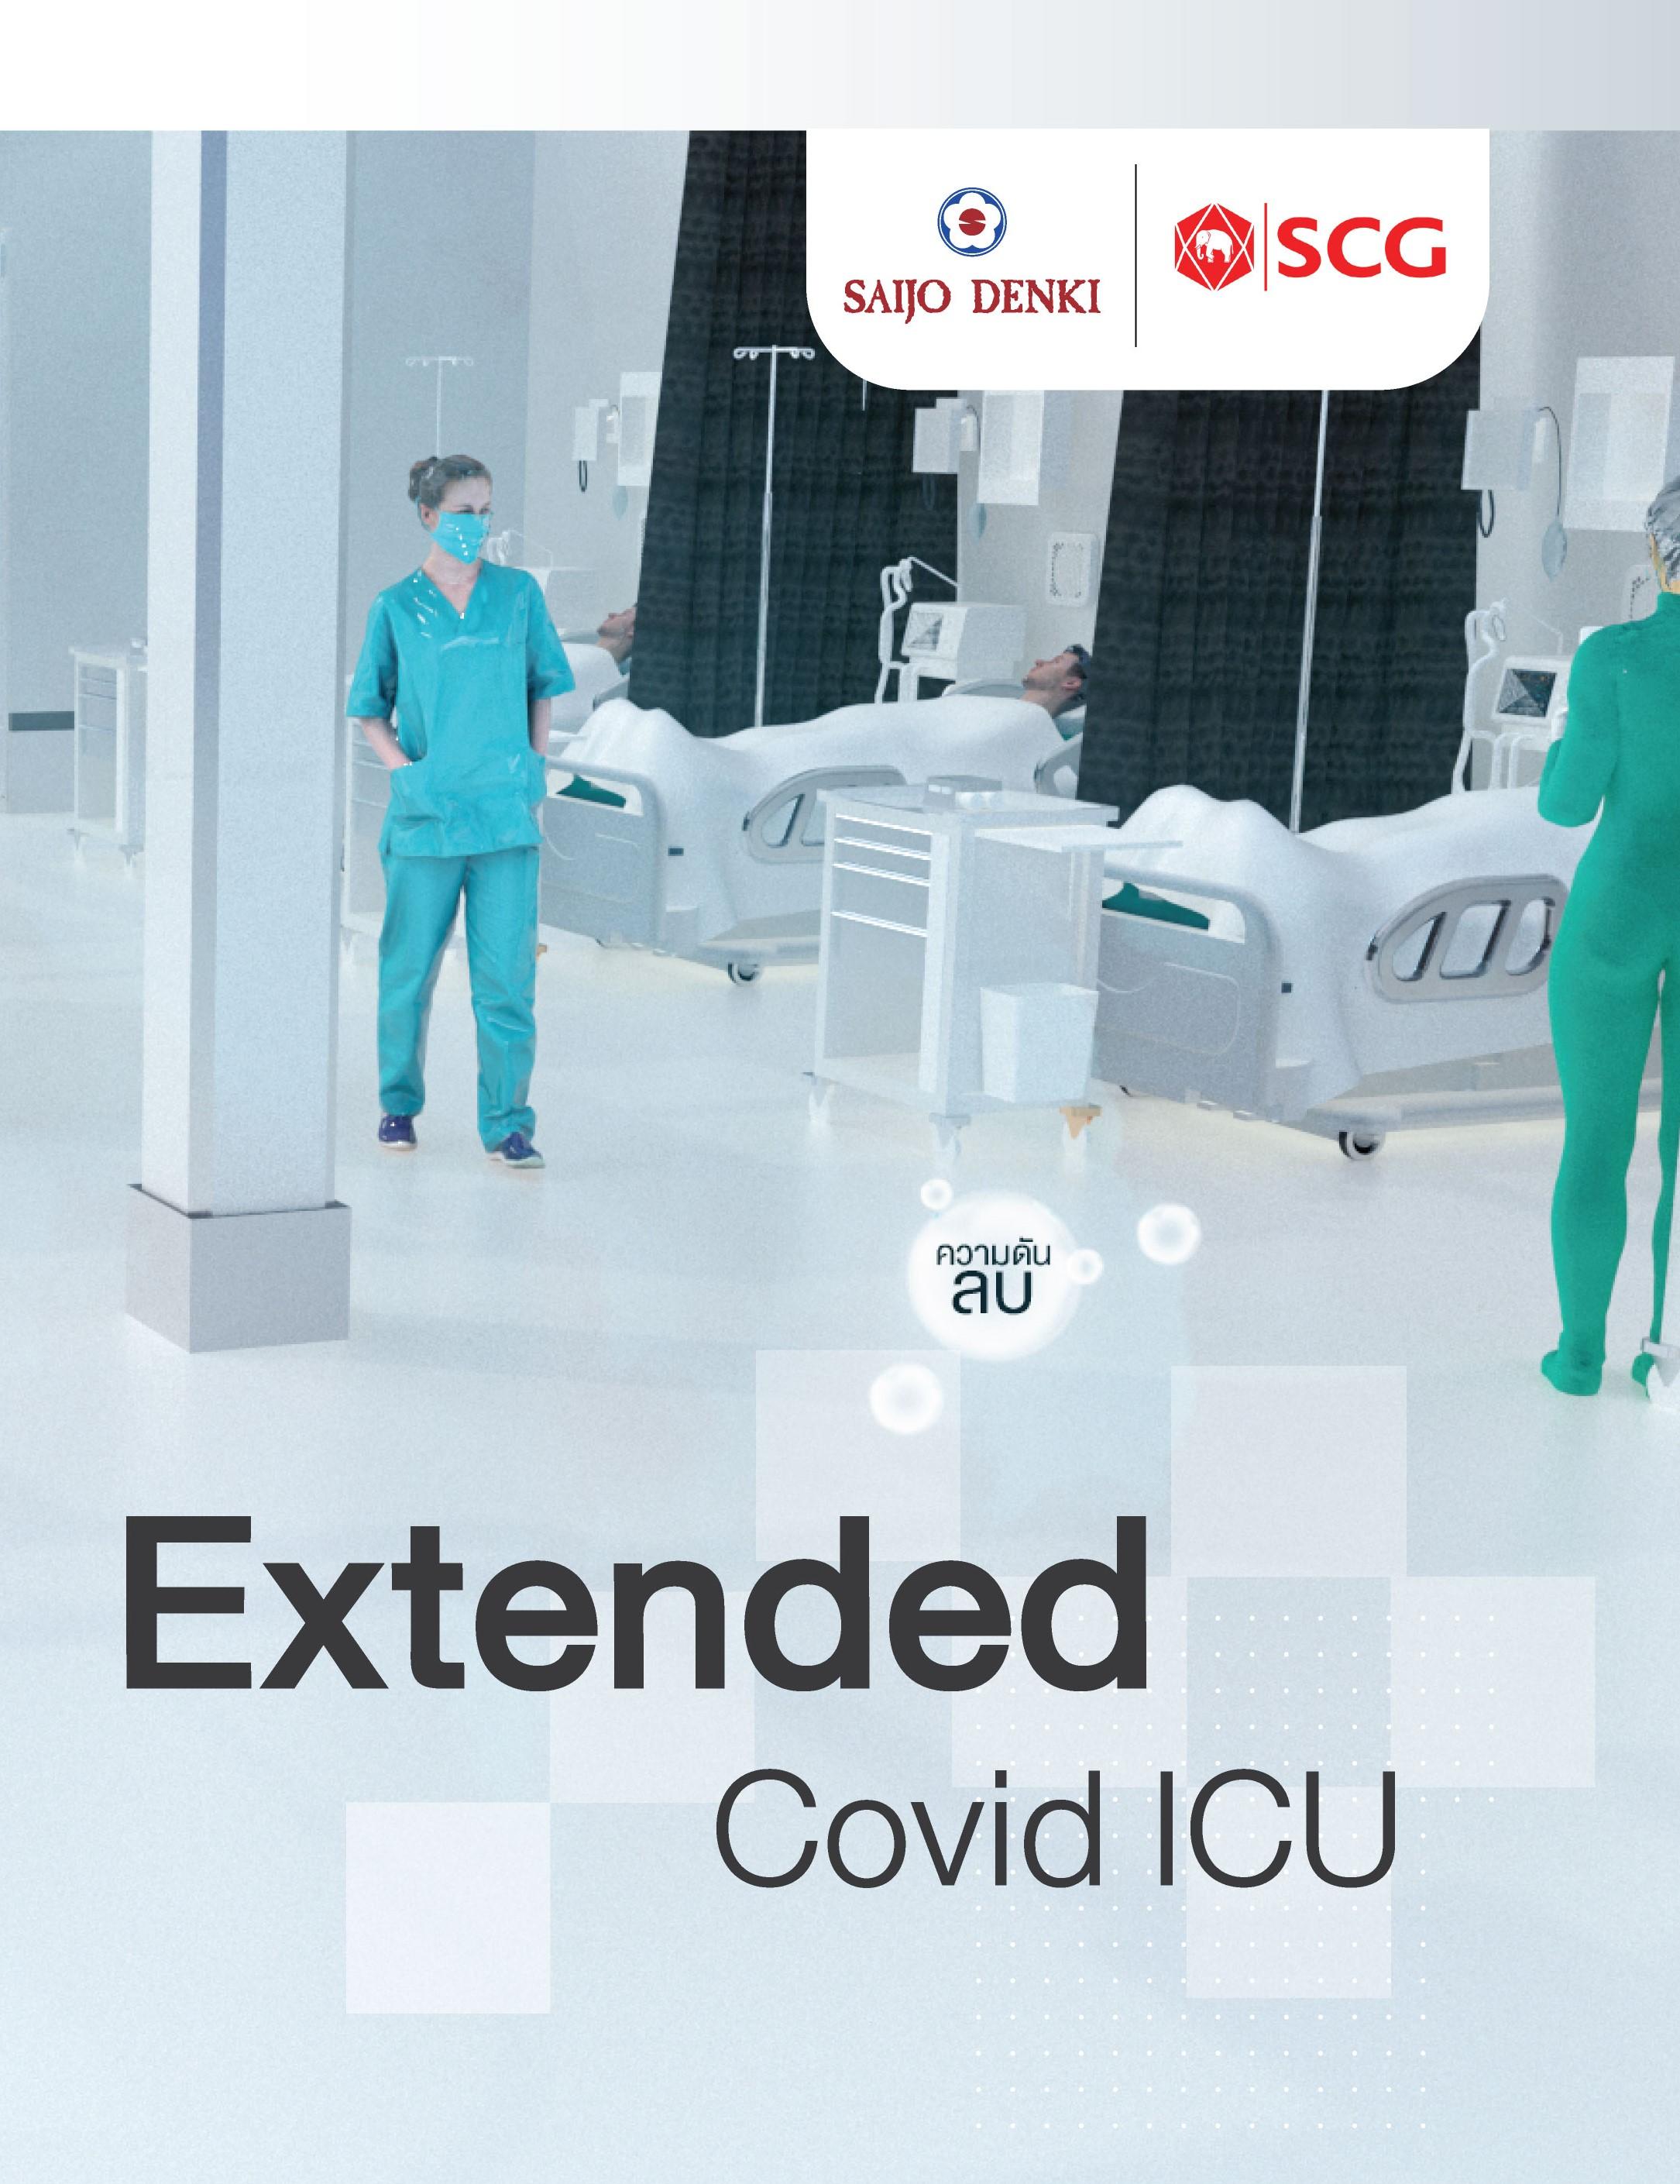 Extended Covid ICU SAIJO DENKI X SCG